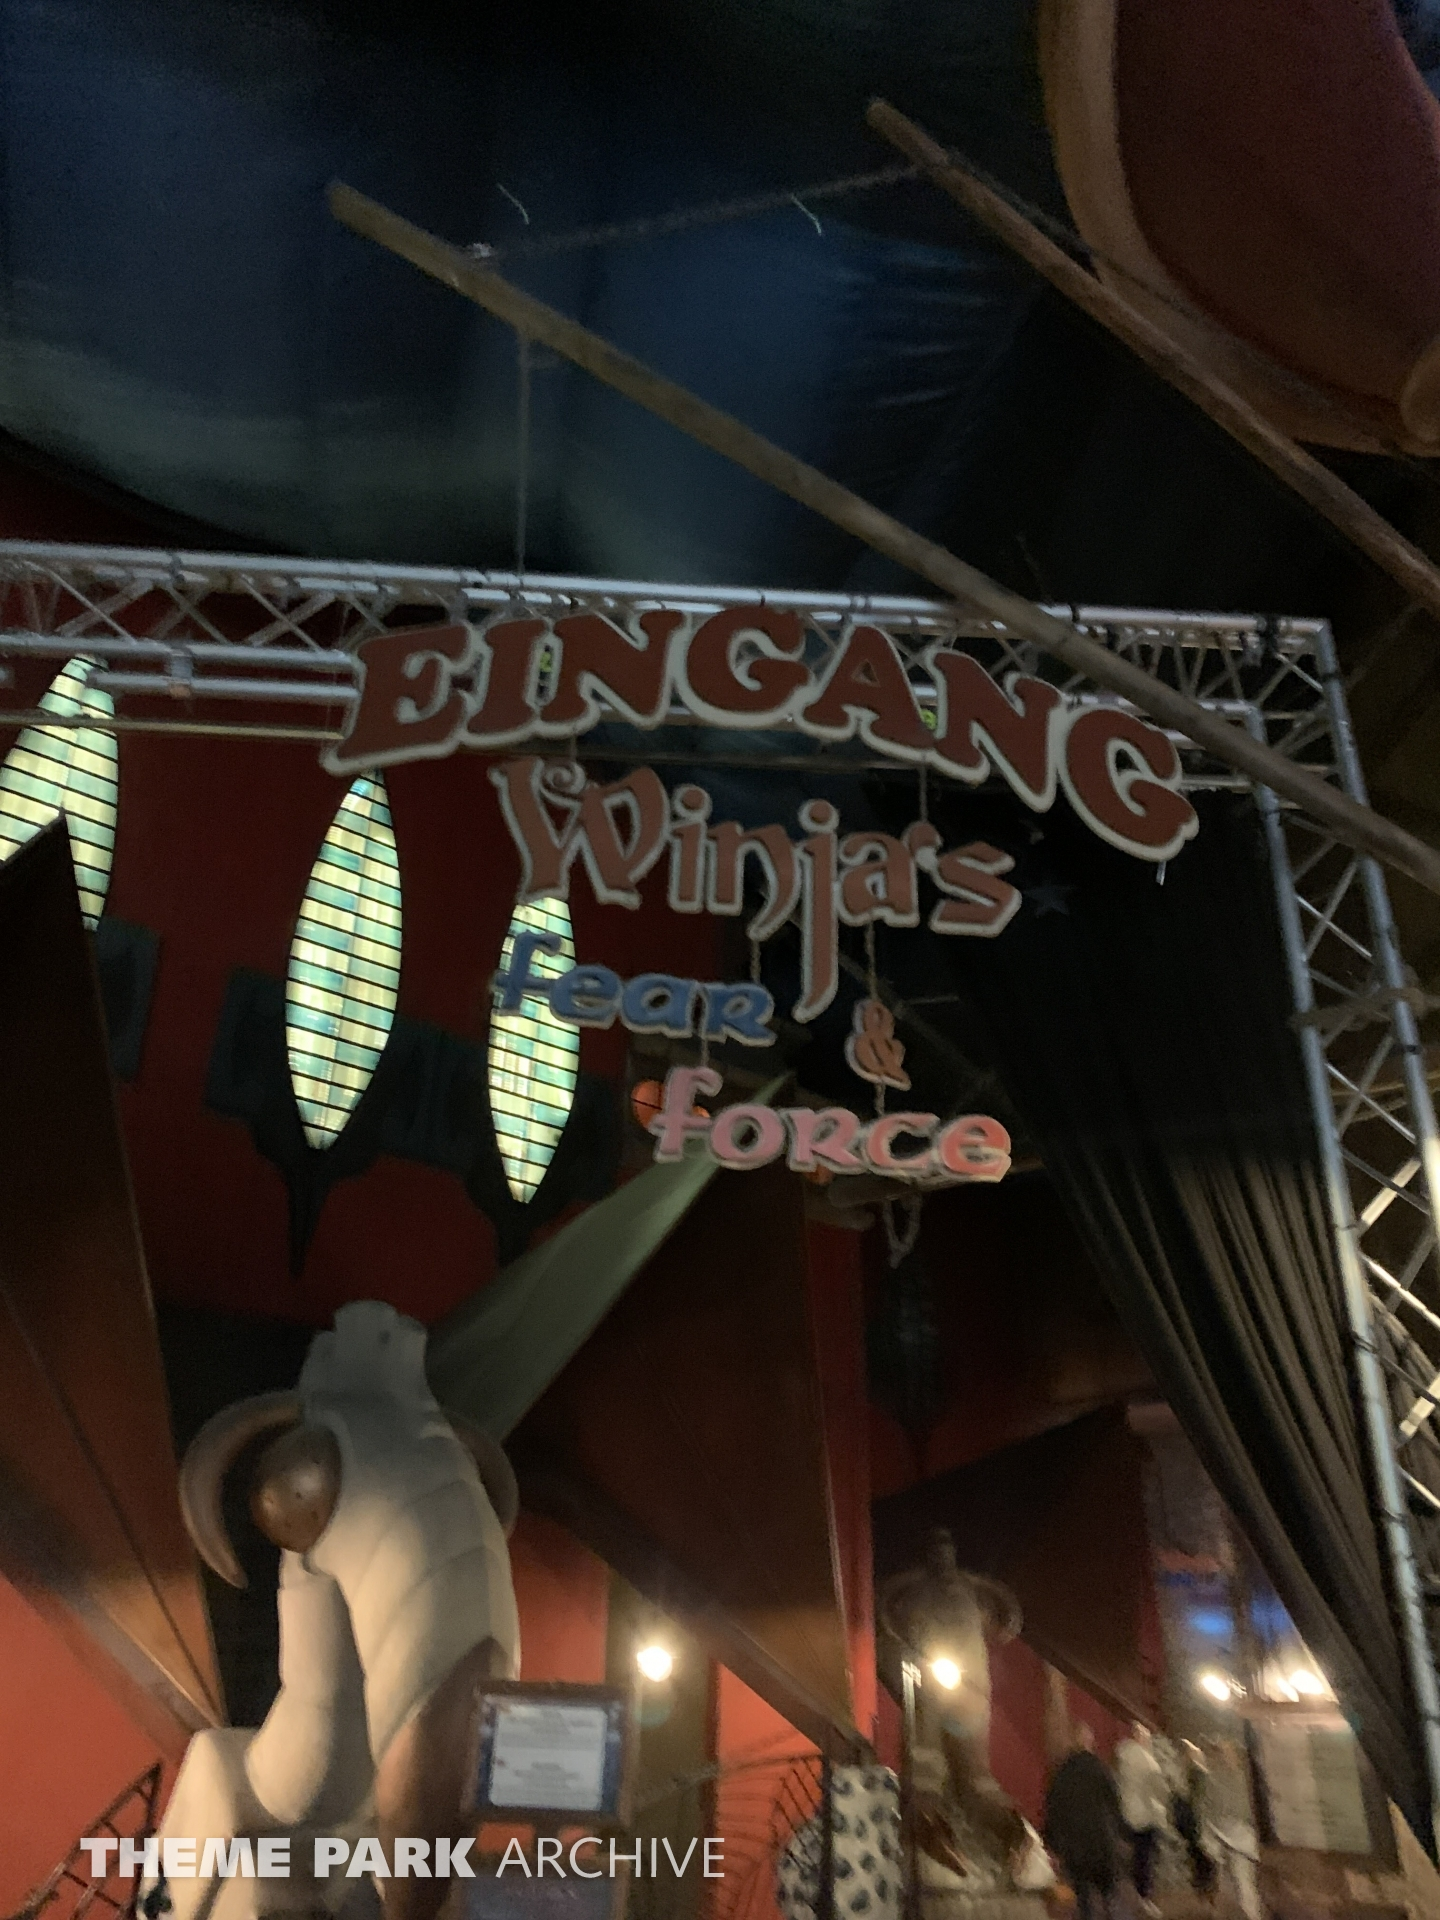 Winjas Fear and Force at Phantasialand